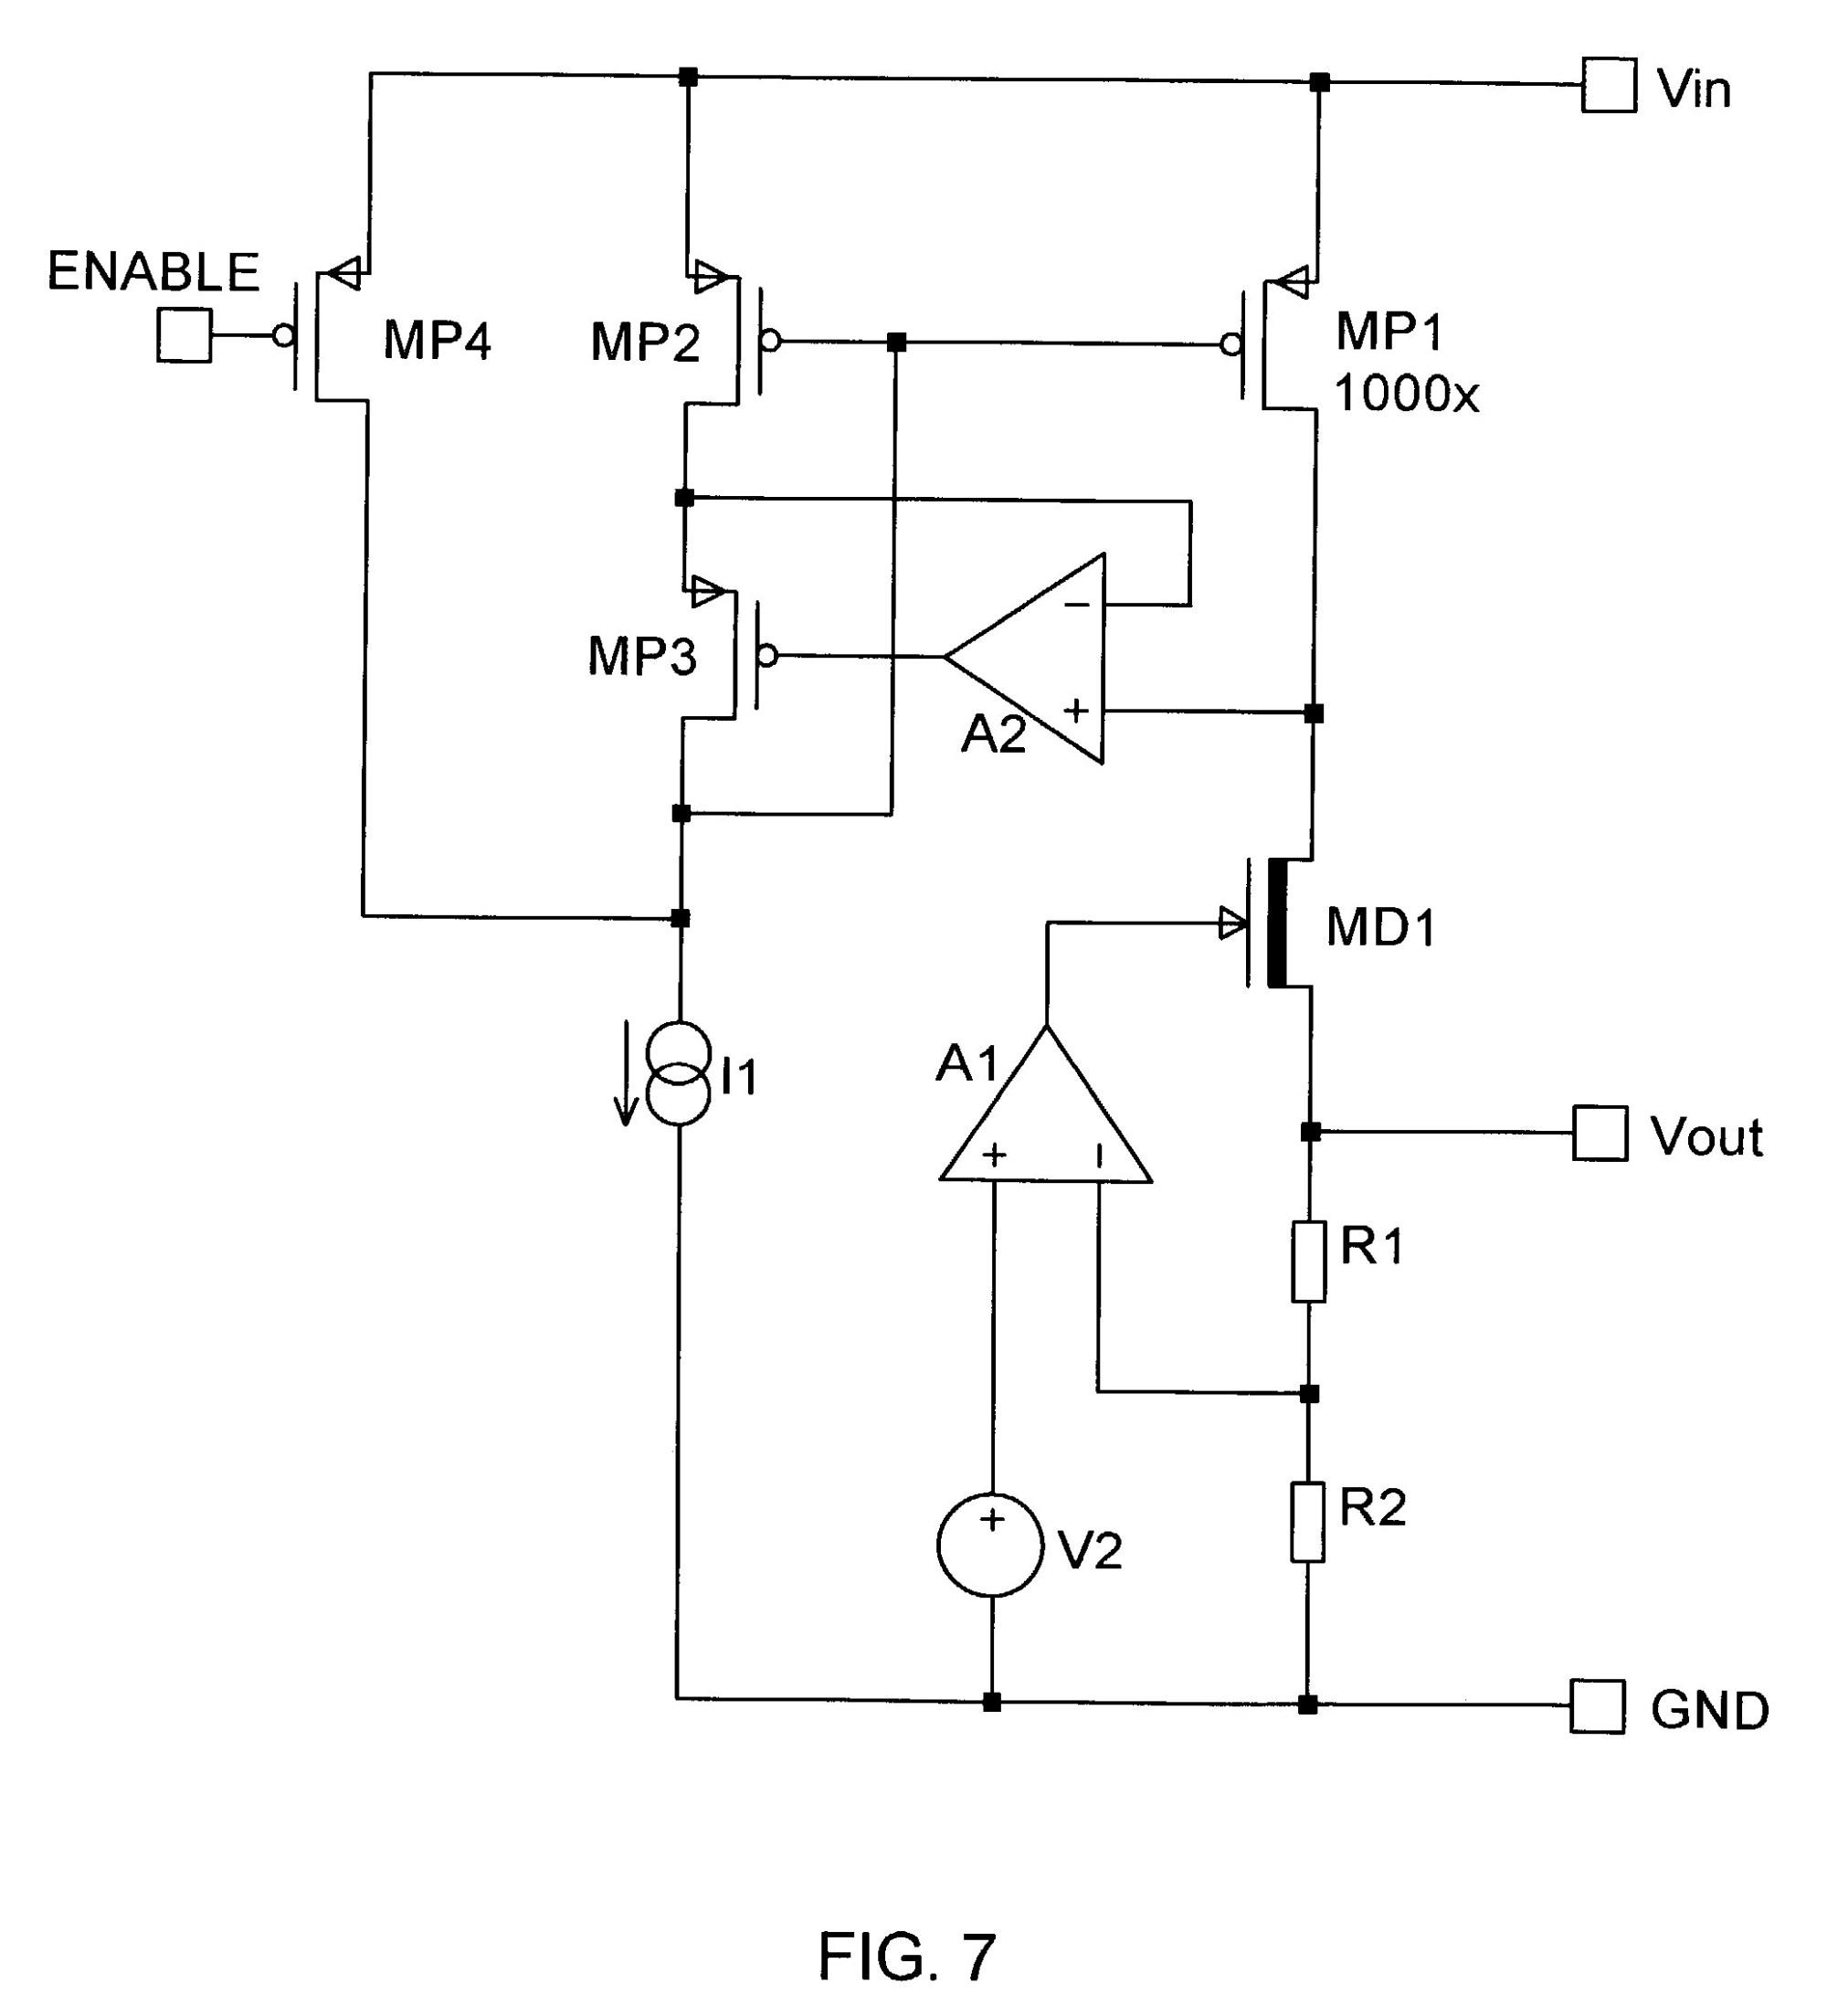 hight resolution of 6 volt regulator circuit wiring diagram image 12v solar panel wiring diagram 12 volt alternator wiring